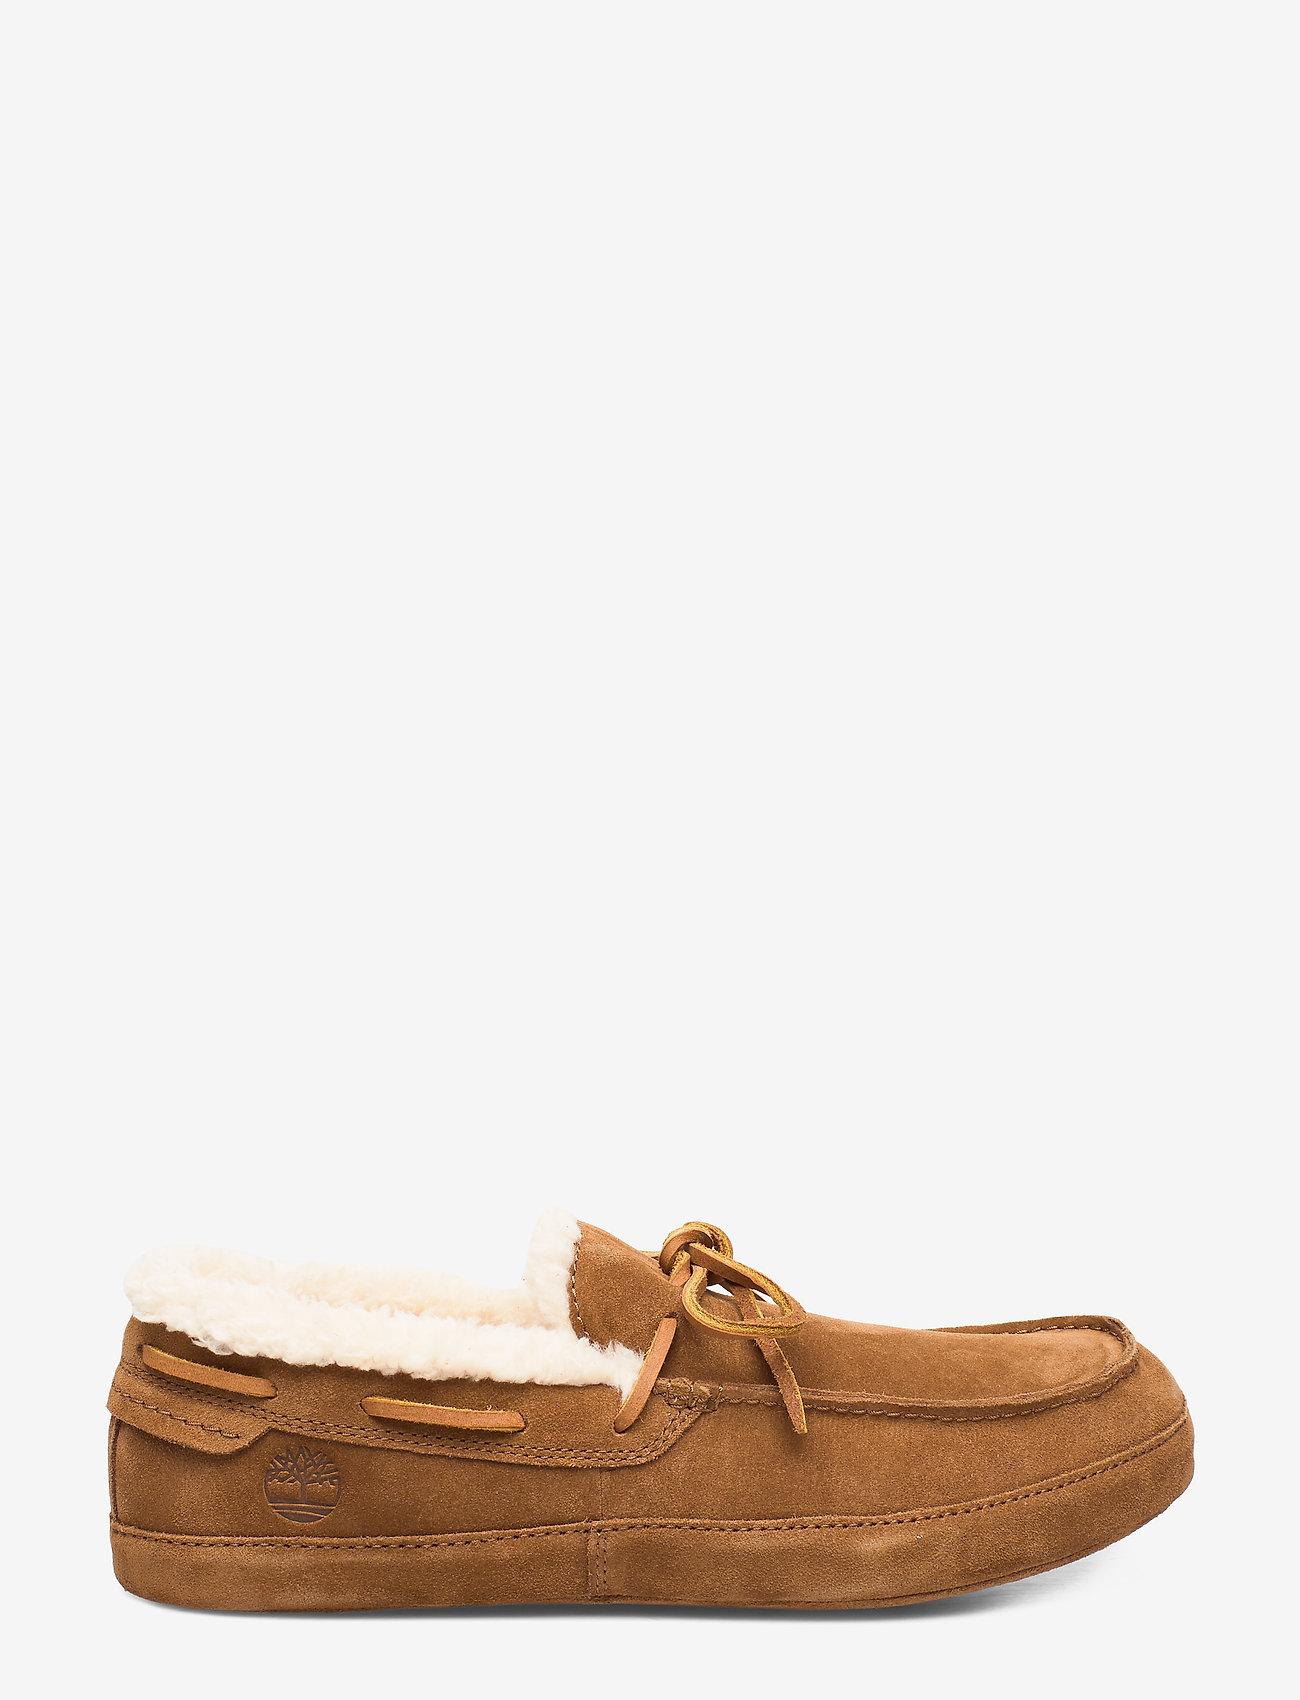 Timberland Torrez Slipper Moccasin - Slippers